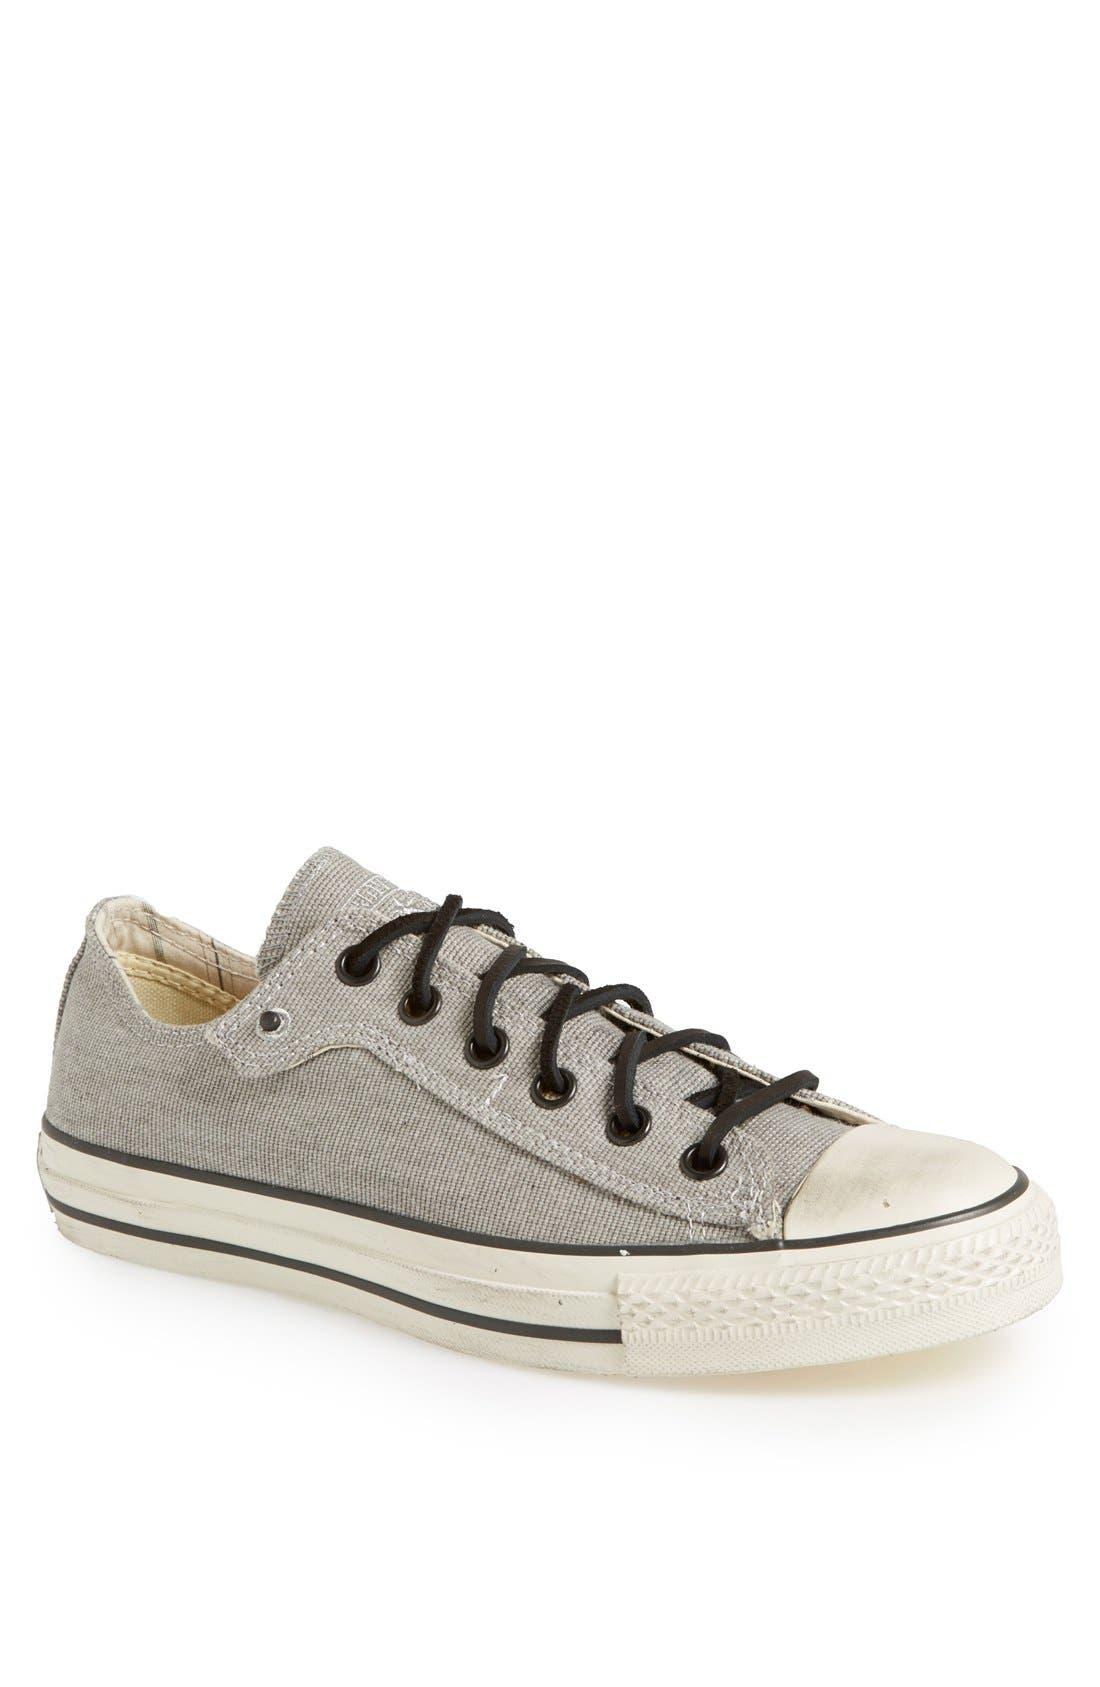 Chuck Taylor<sup>®</sup> Low Sneaker,                             Main thumbnail 1, color,                             020